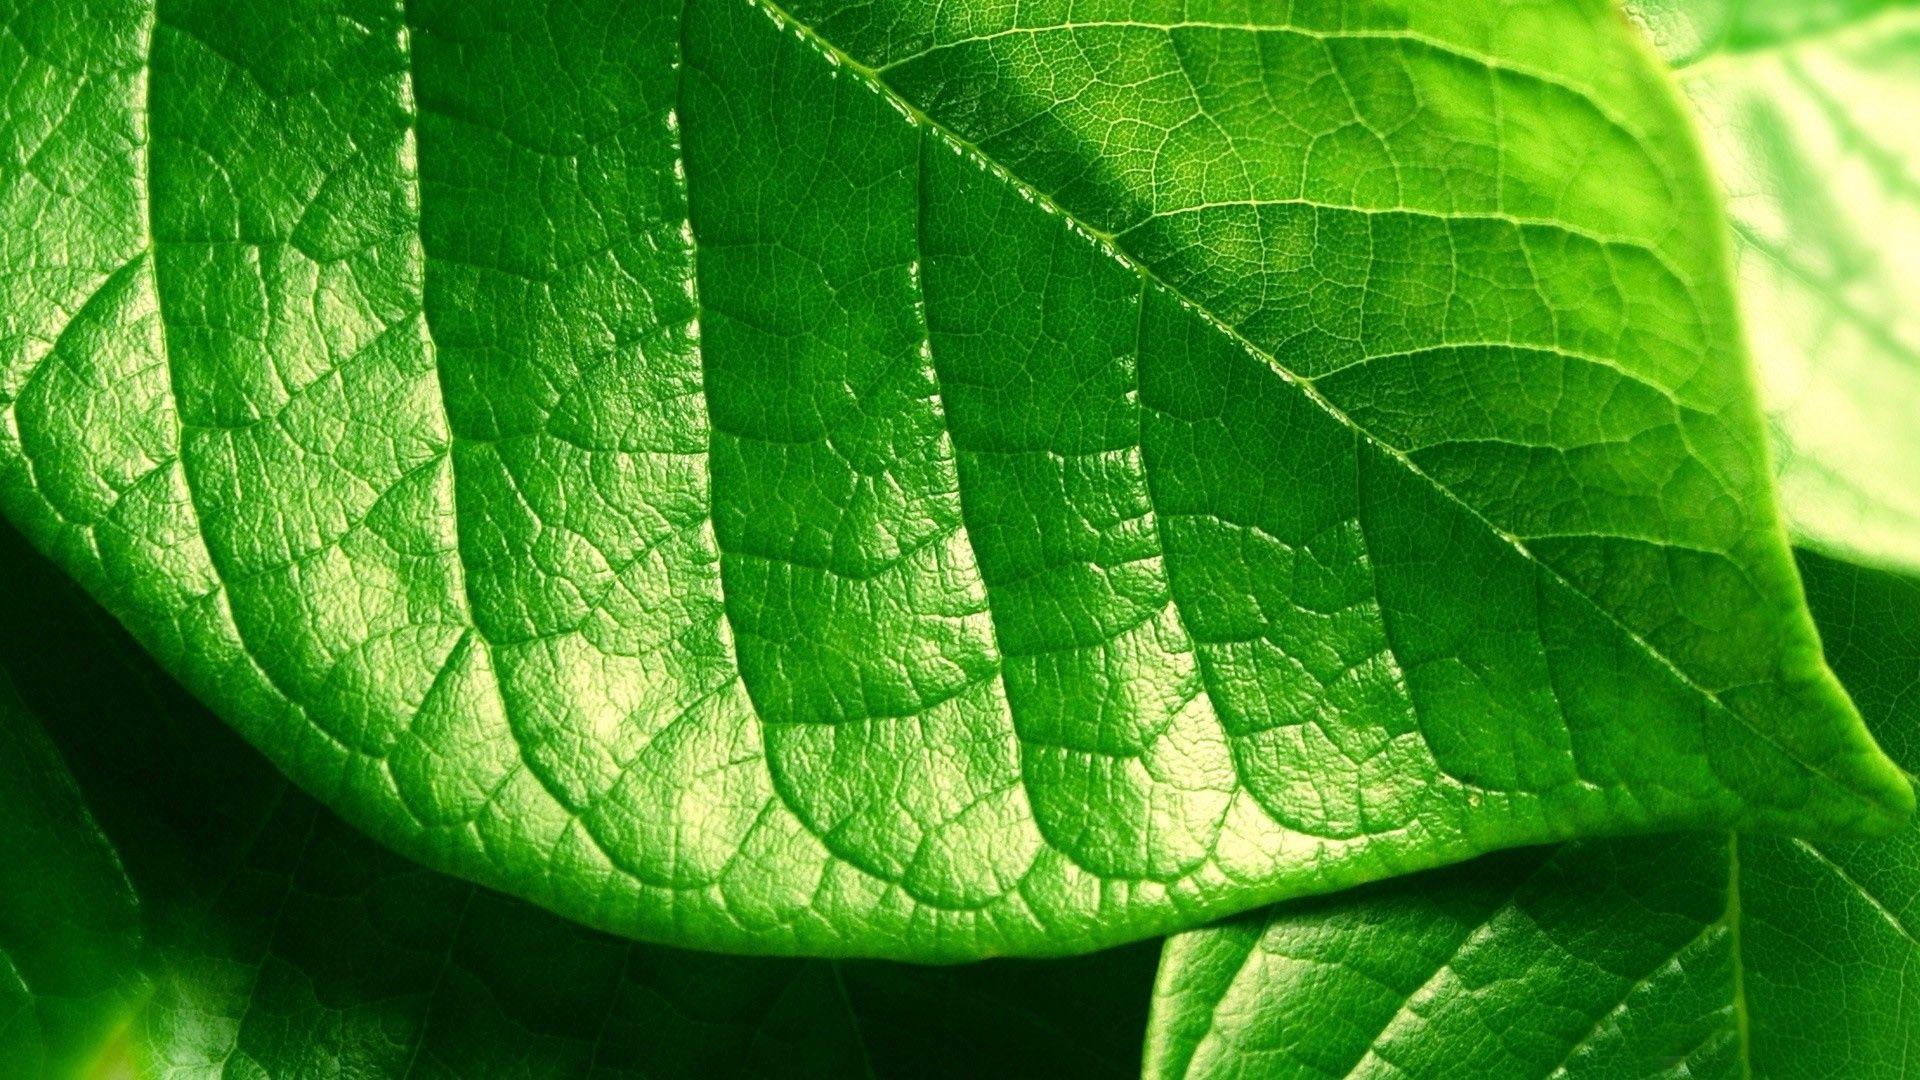 Green Leaf Wallpaper WallpaperSafari sisay Pinterest